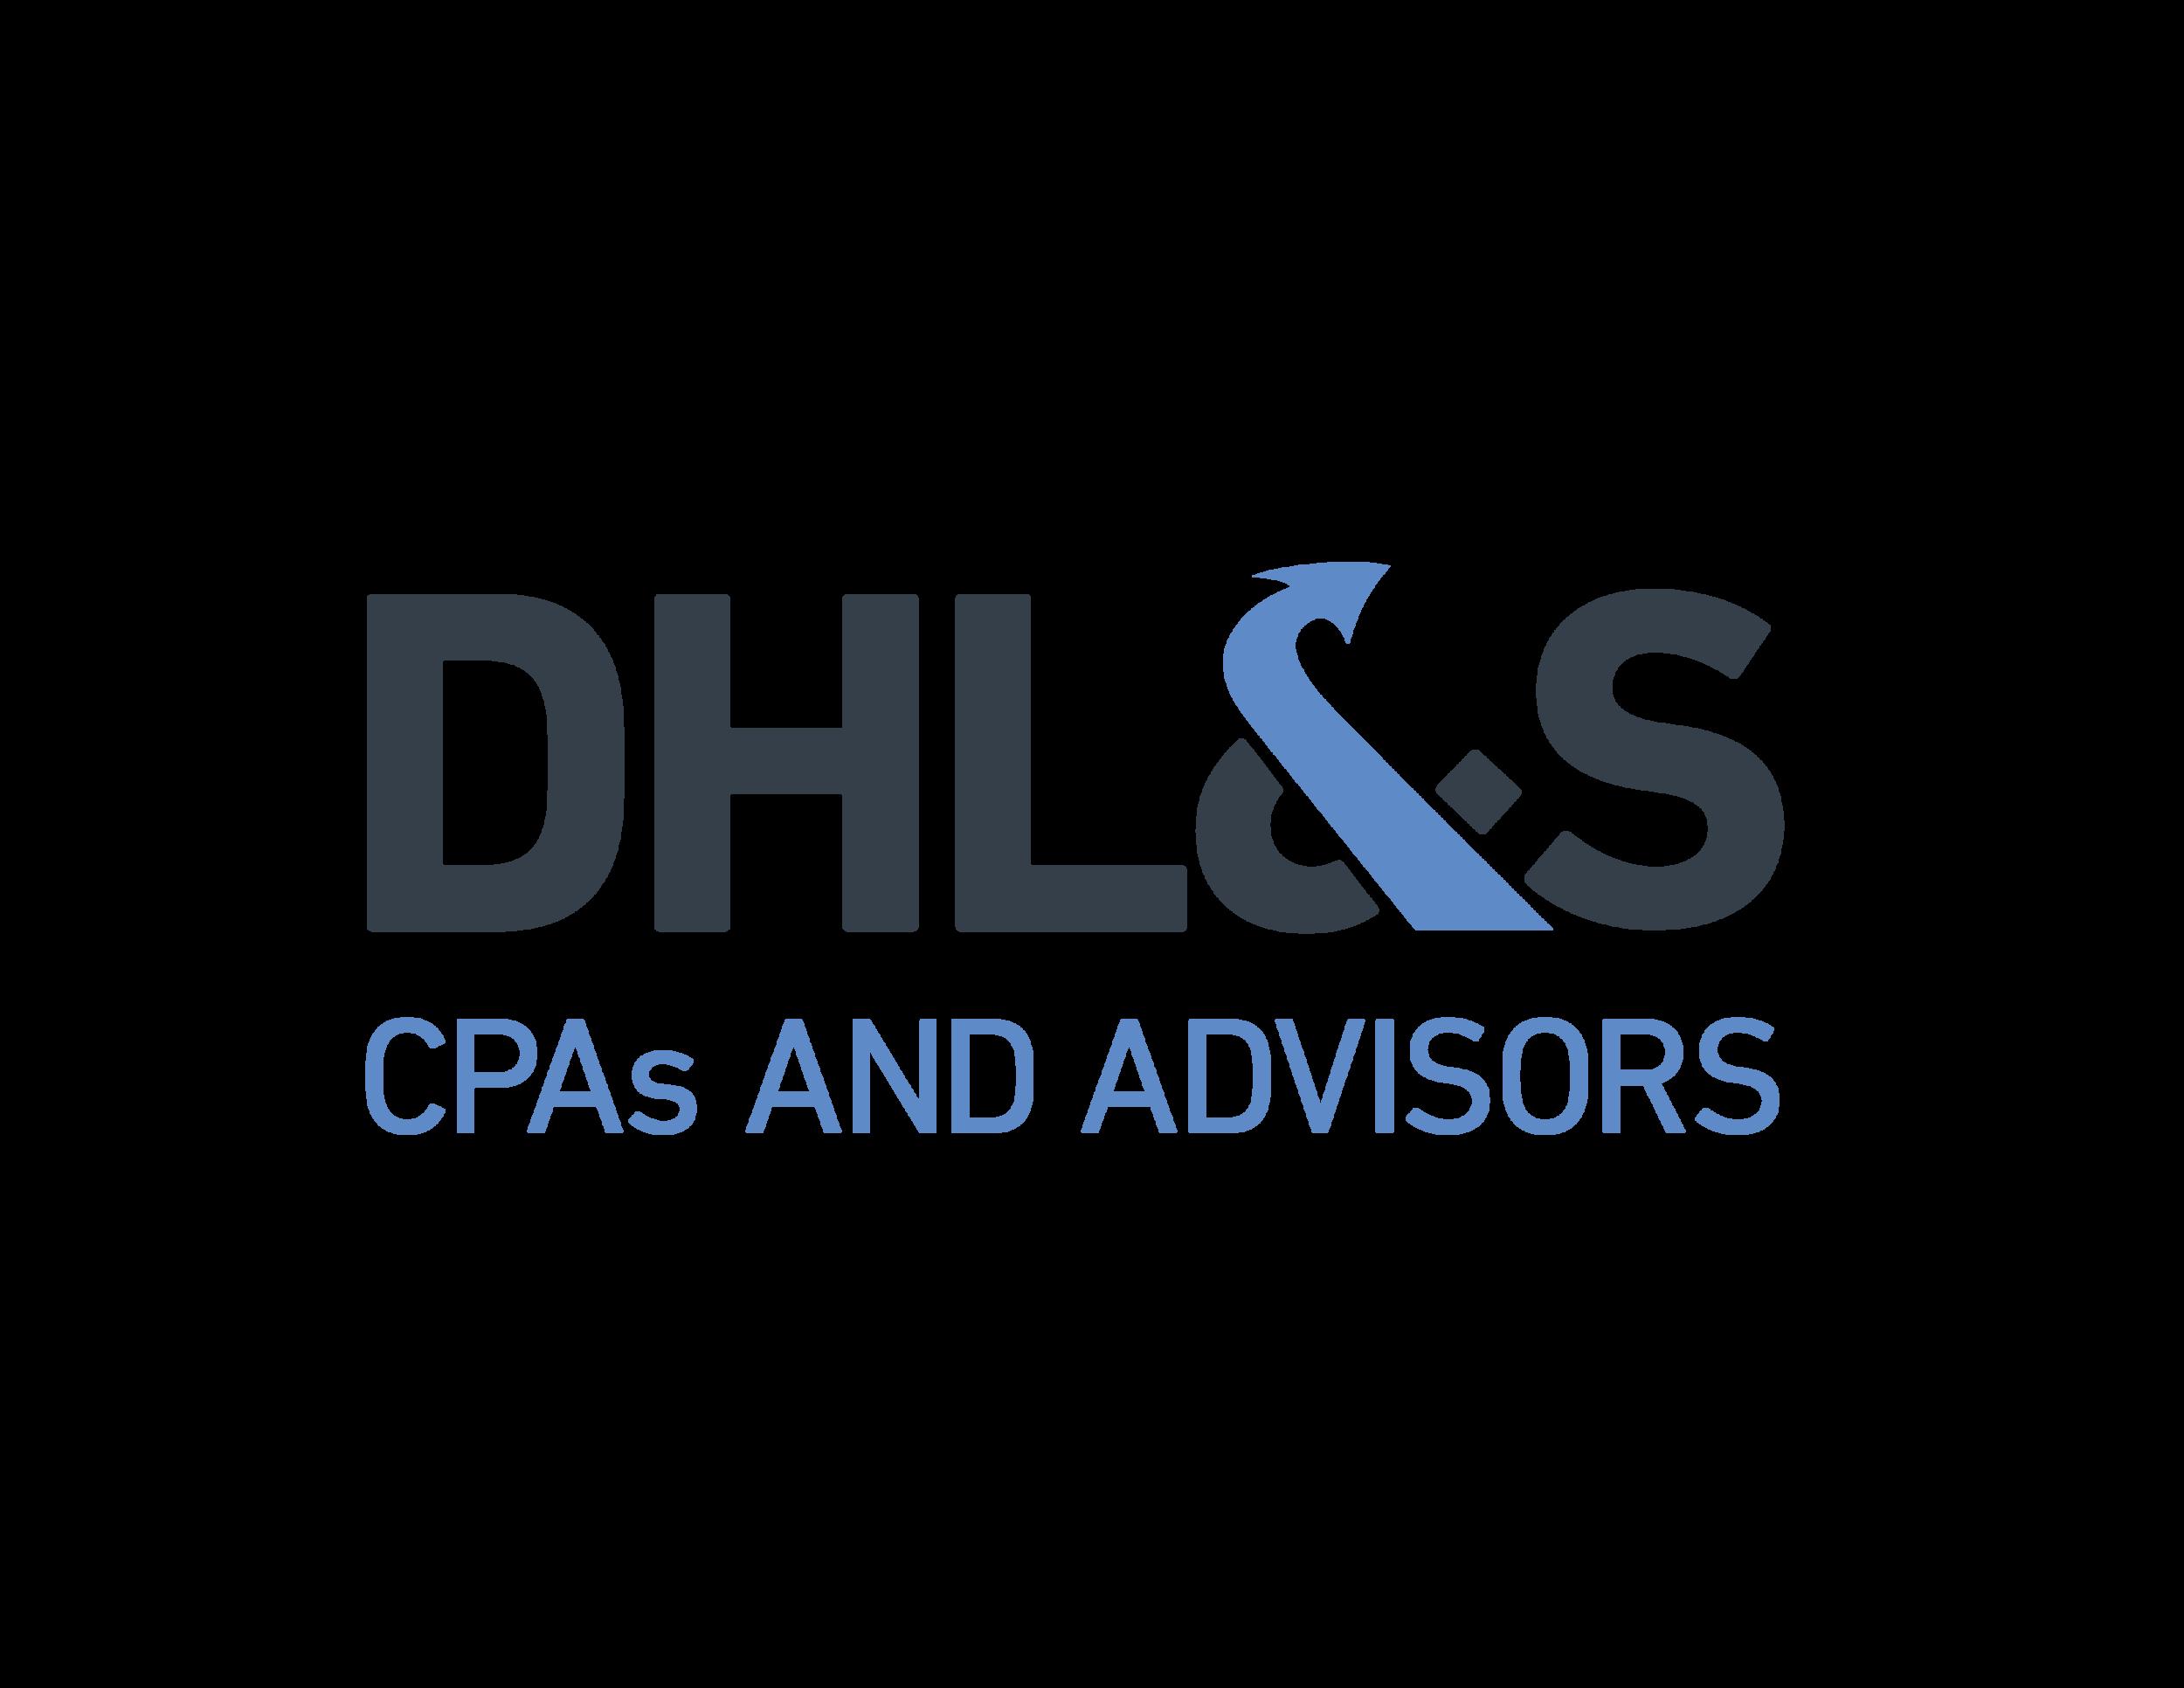 DHLS_Logo-Final_4C-01.png